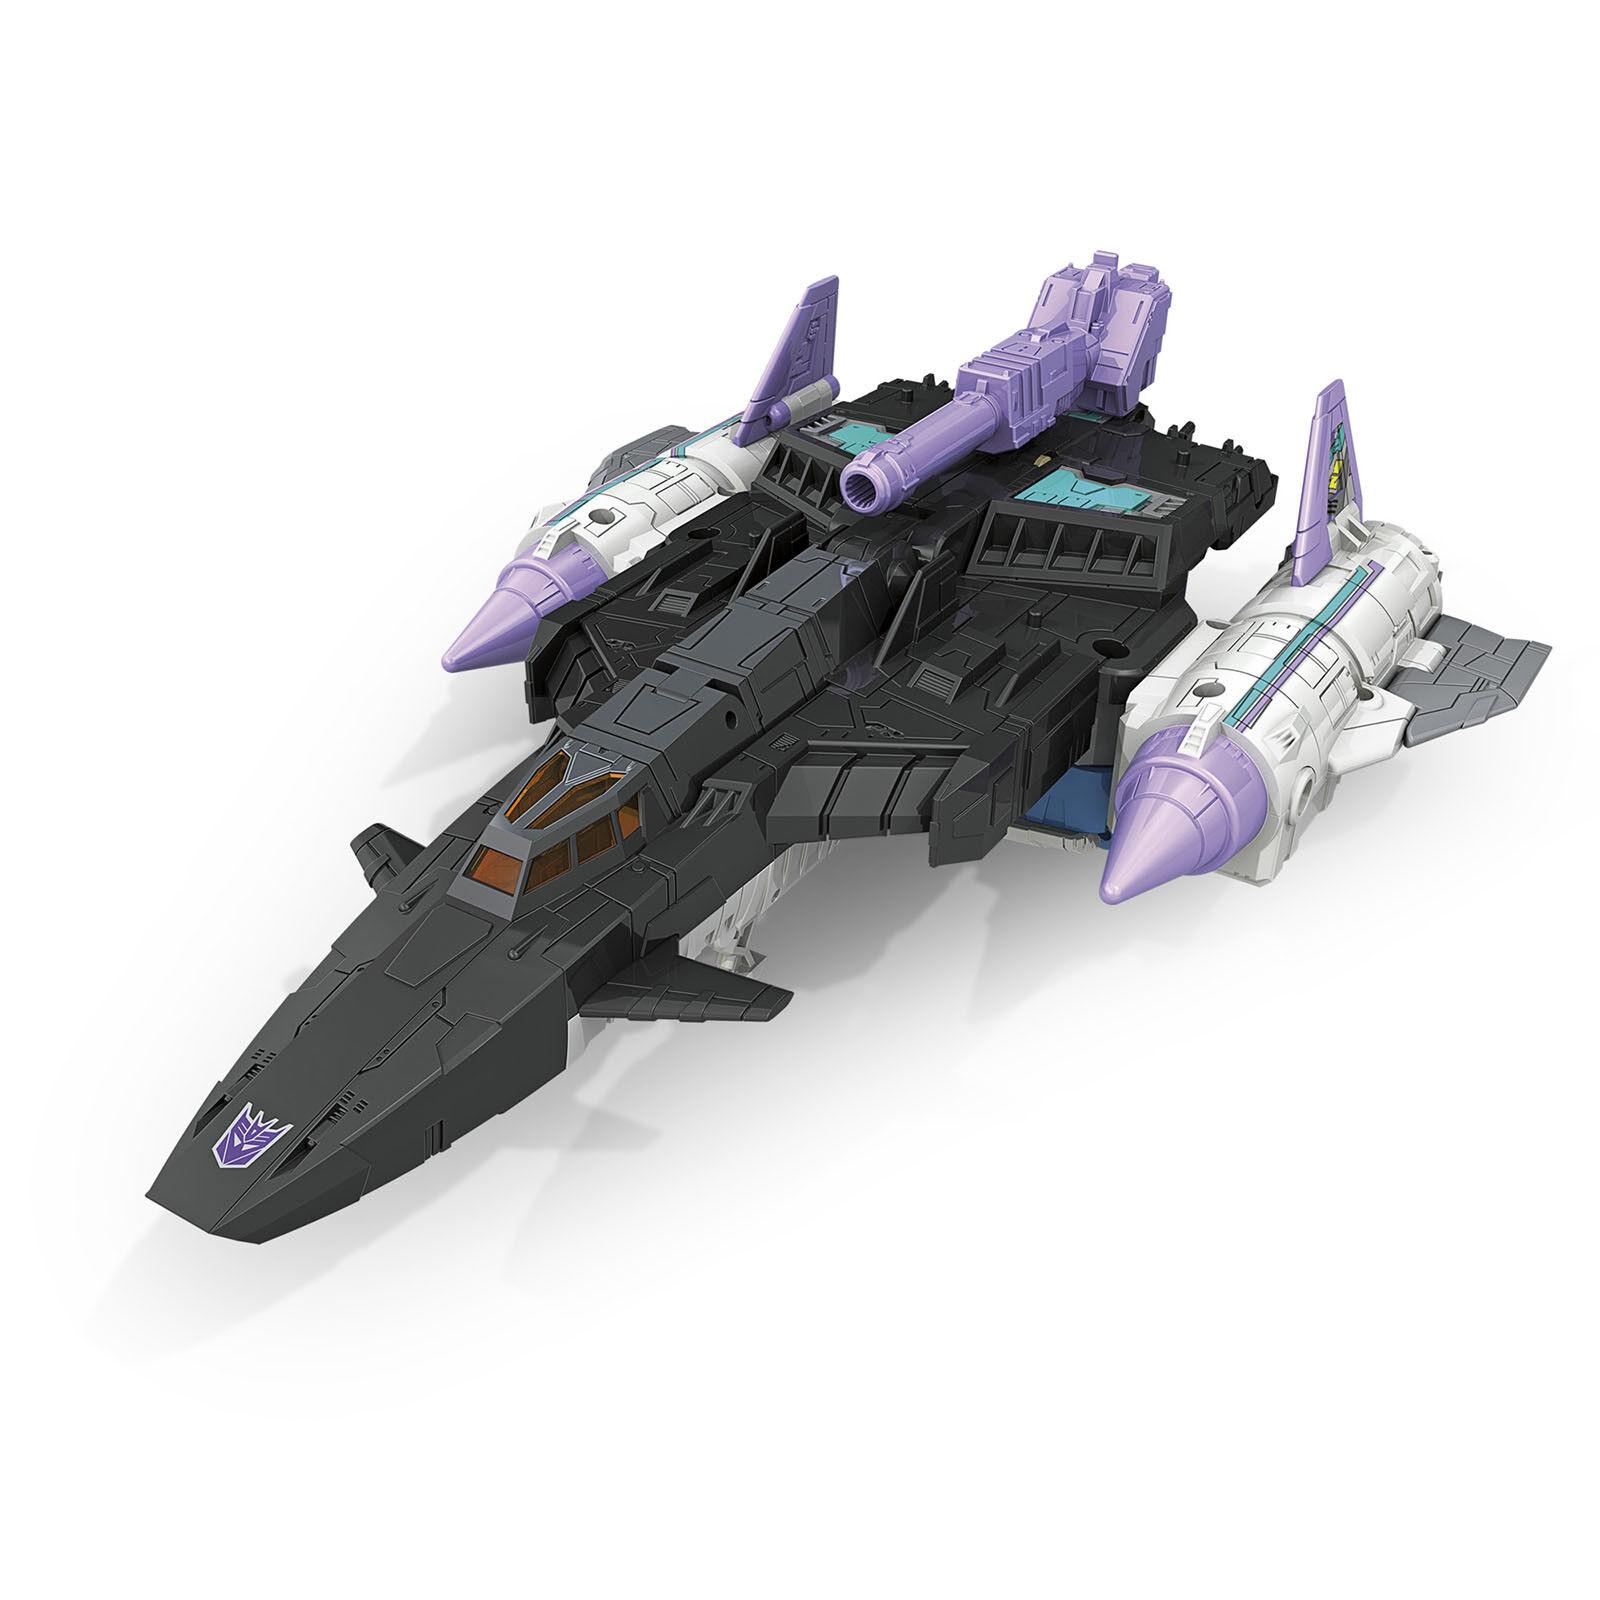 Transformers IDW Titans Return Leader Class DREADNAUT &DECEPTION &DECEPTION &DECEPTION OVERLORD Figure df4c95